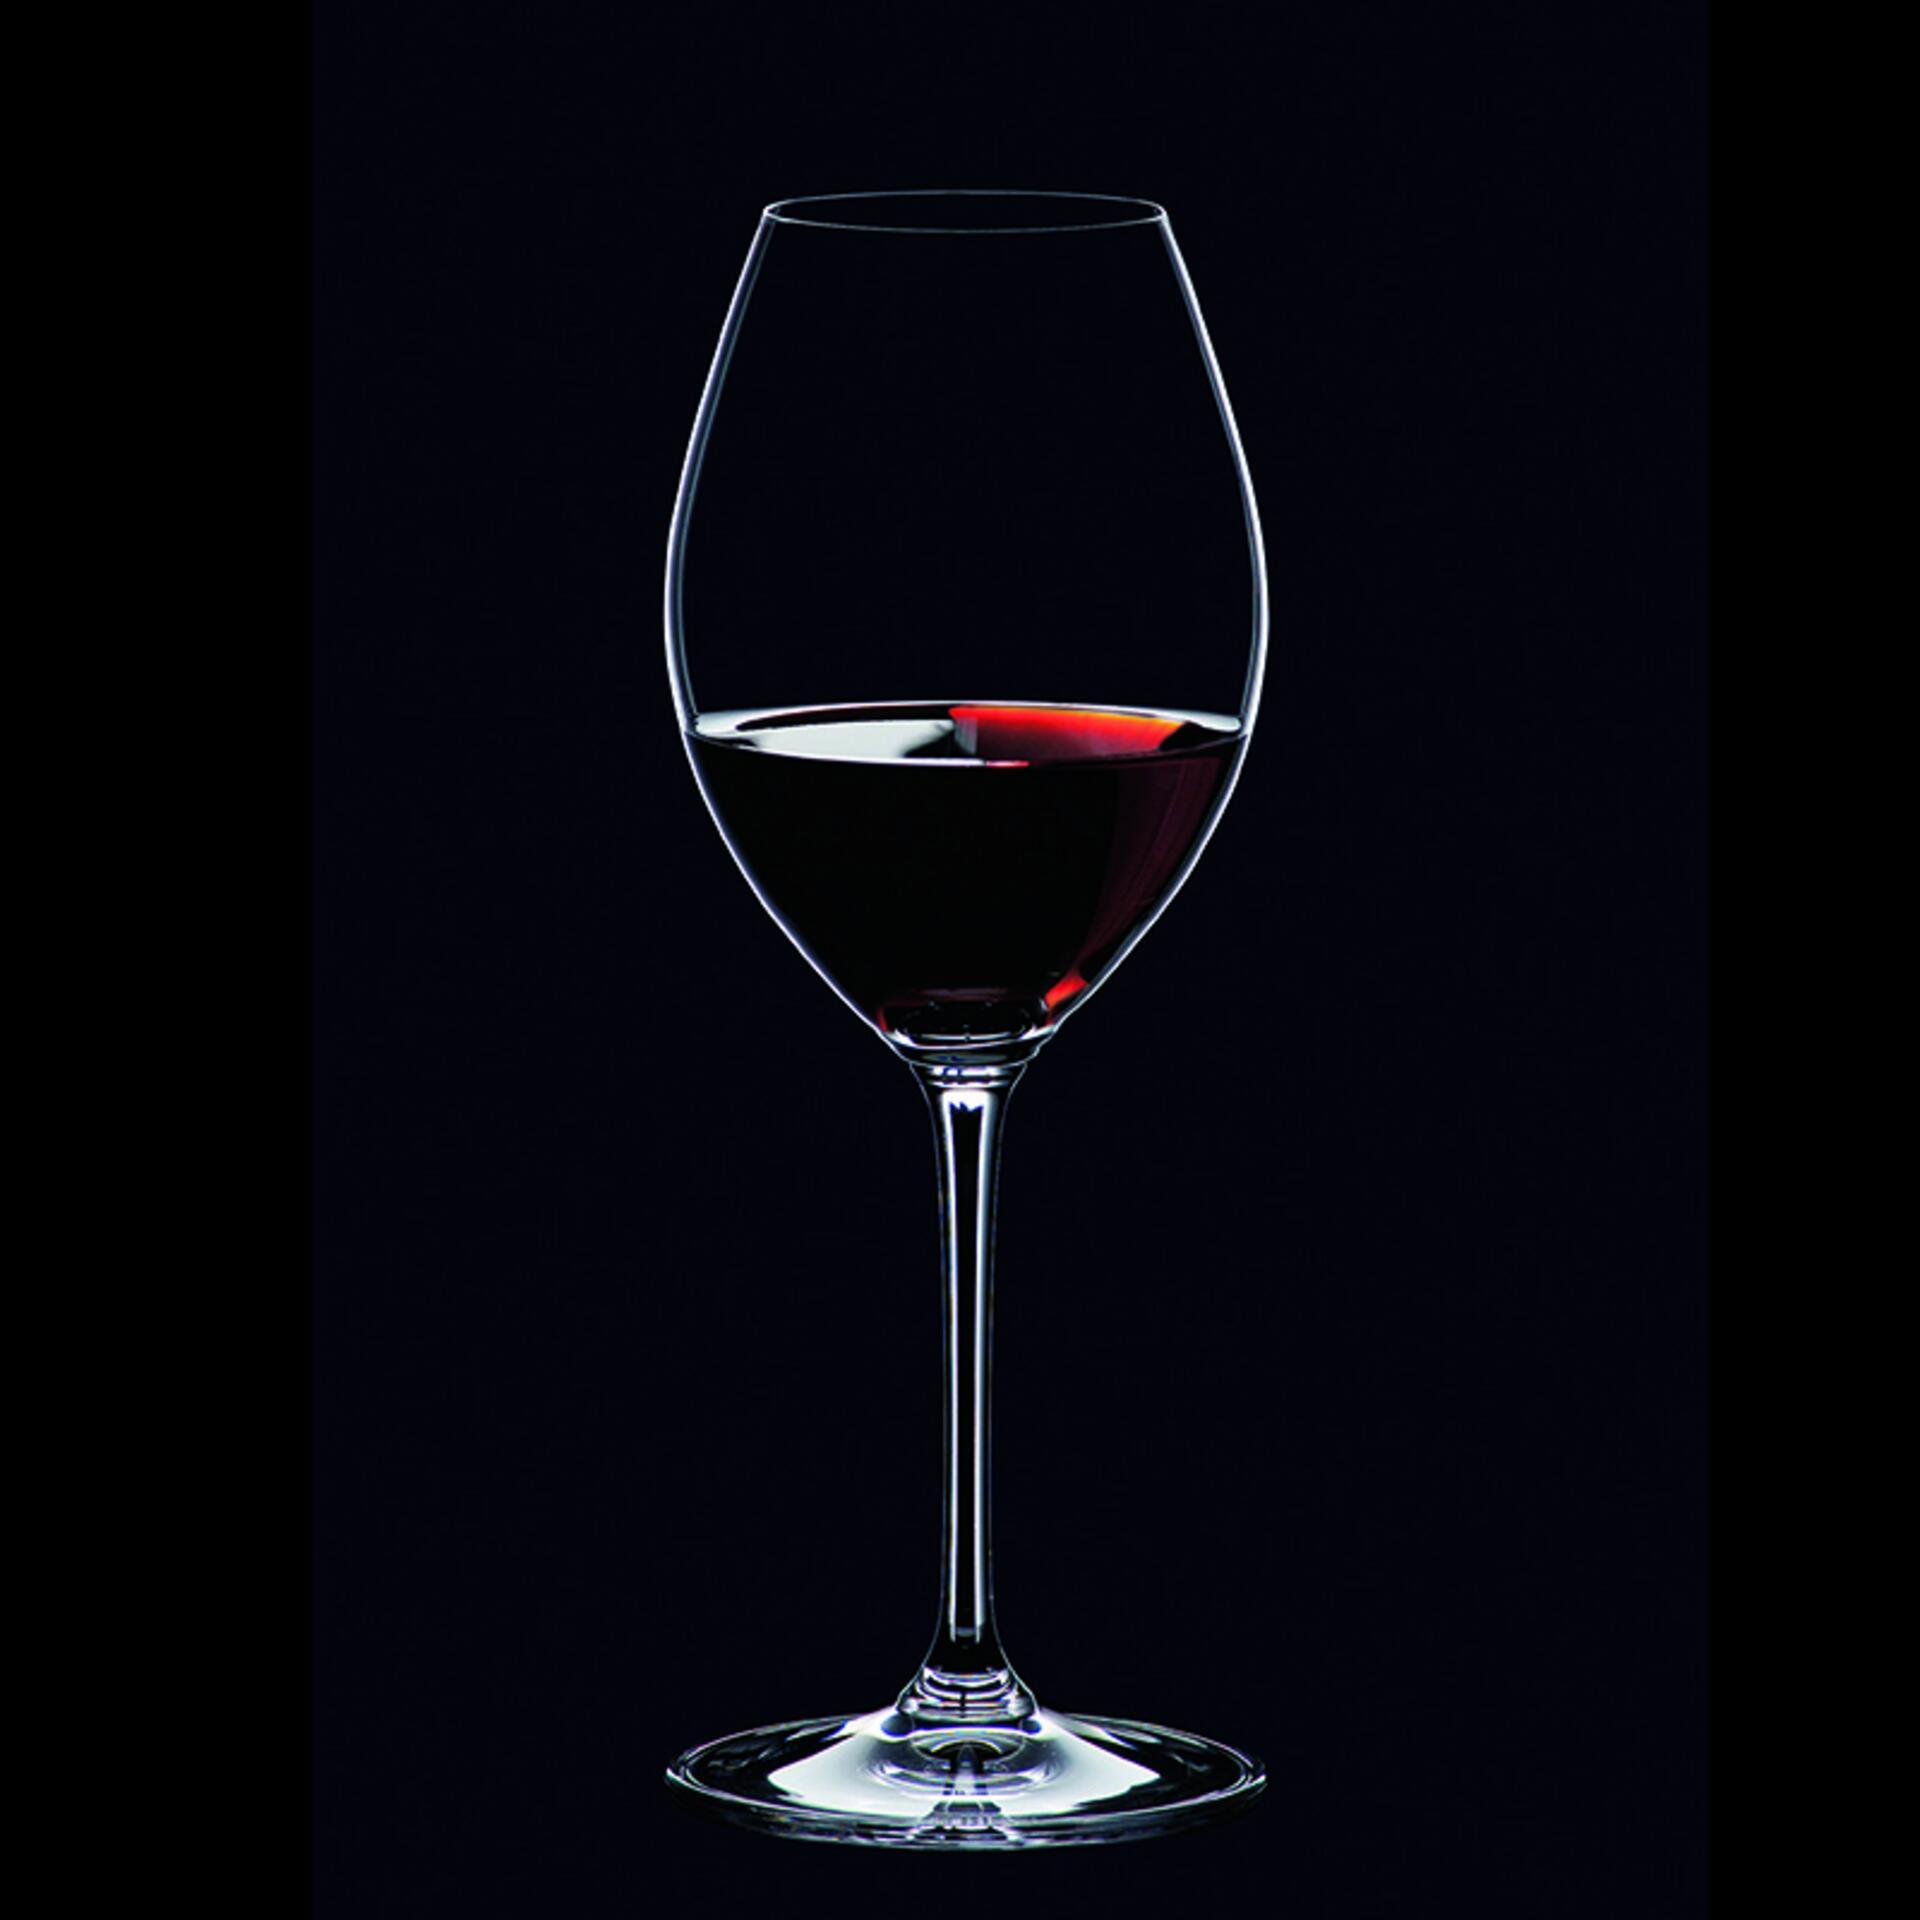 Riedel Vinum Rotweinglas Tempranillo 2 Stück 6416/31